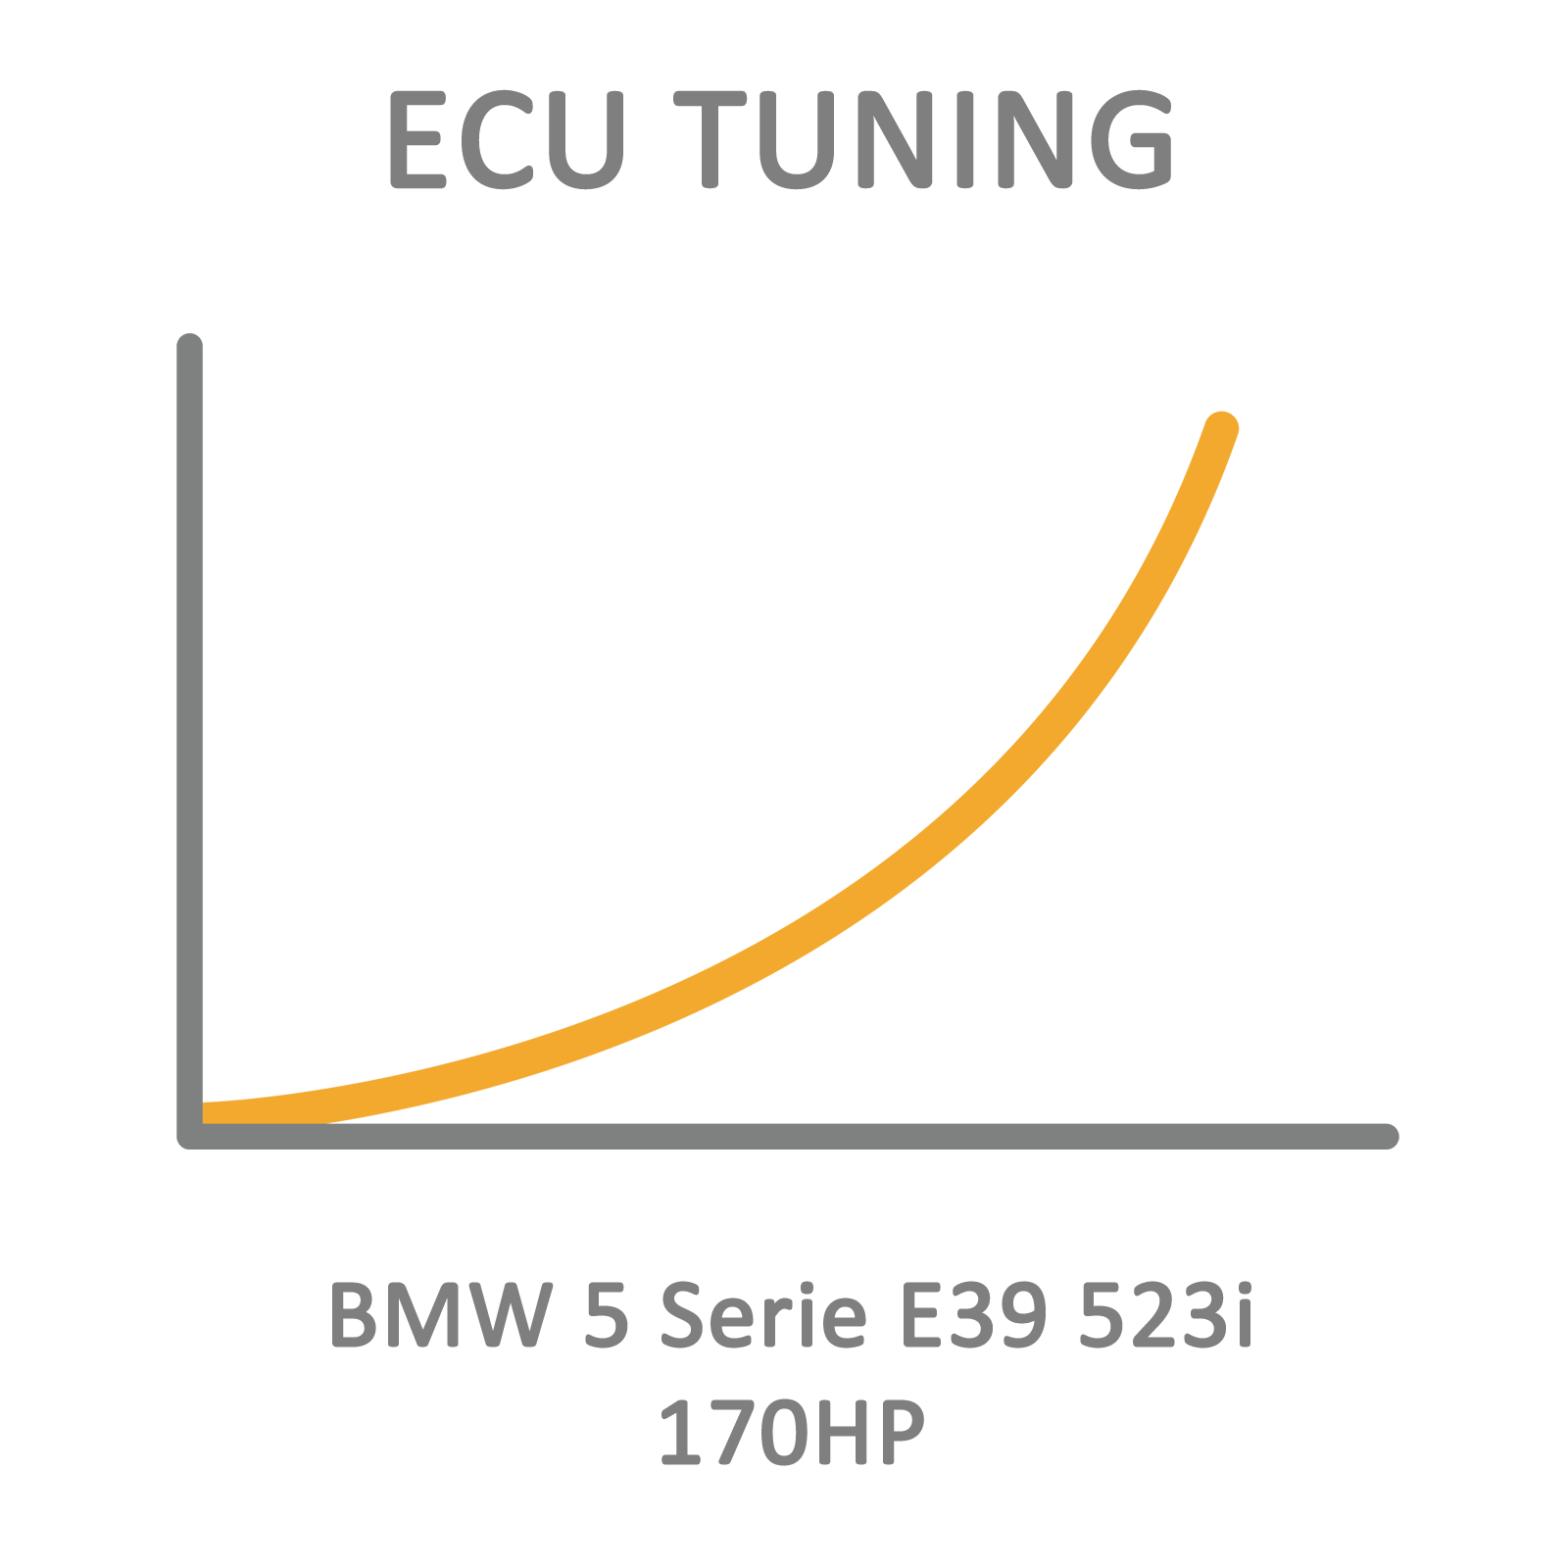 BMW 5 Series E39 523i 170HP ECU Tuning Remapping Programming